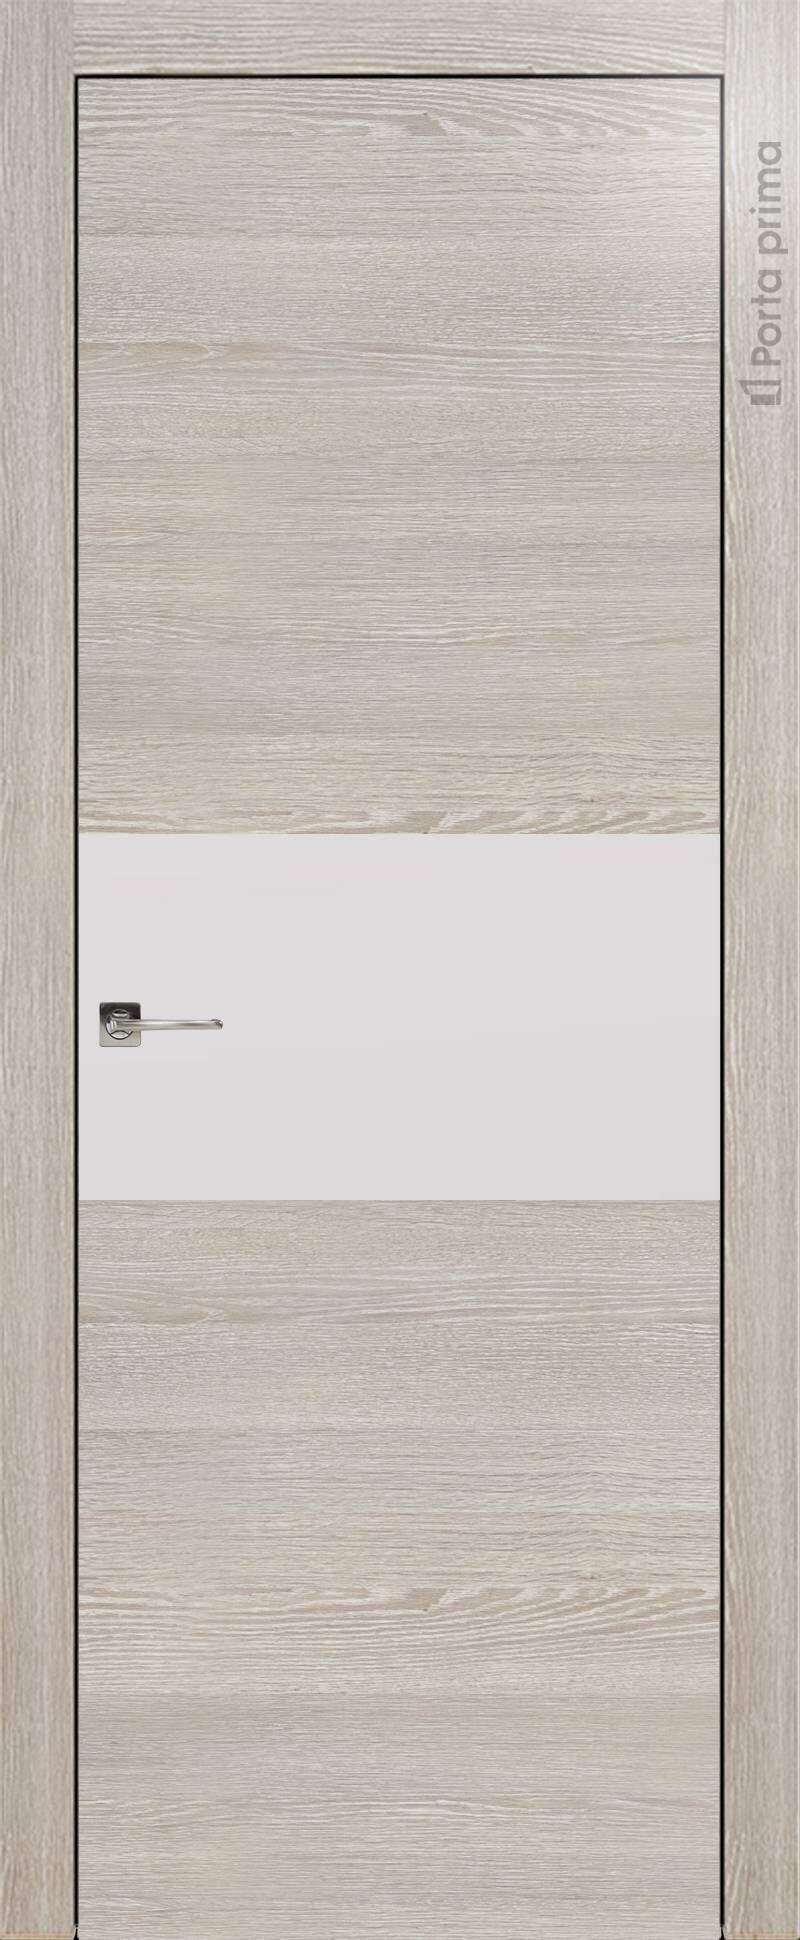 Tivoli Е-4 цвет - Серый дуб Без стекла (ДГ)